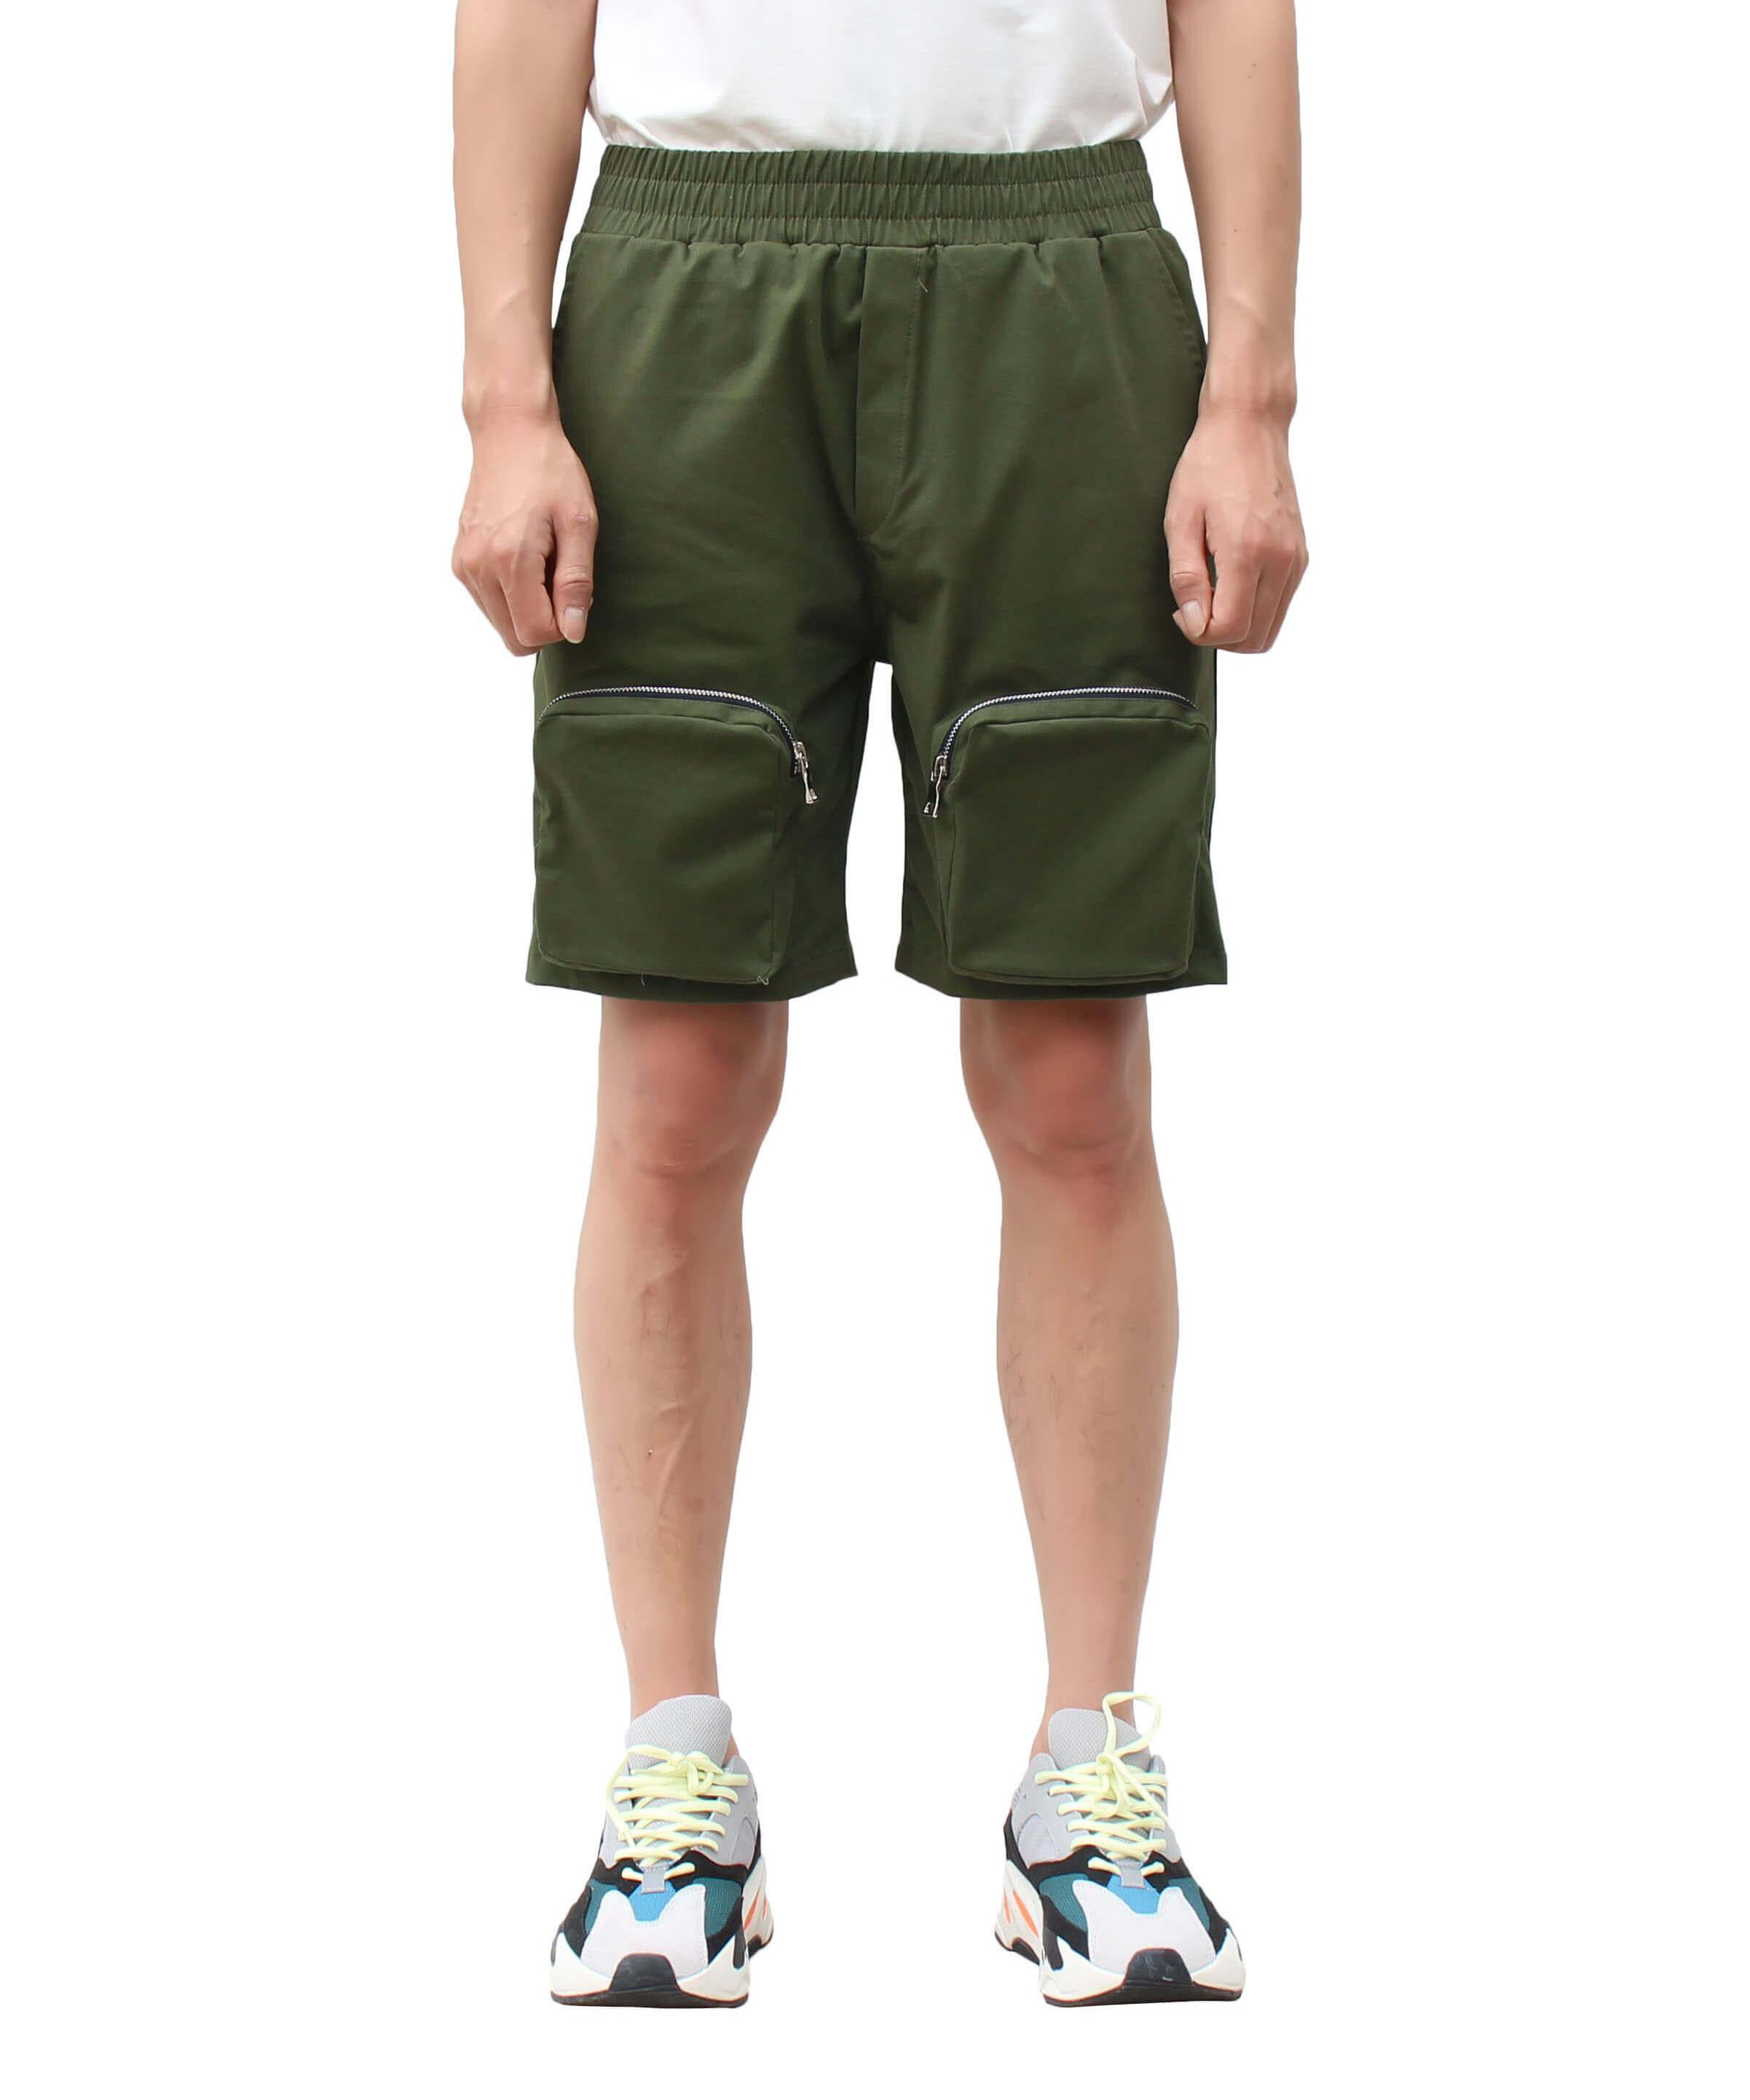 Cargo Shorts V1 - Olive